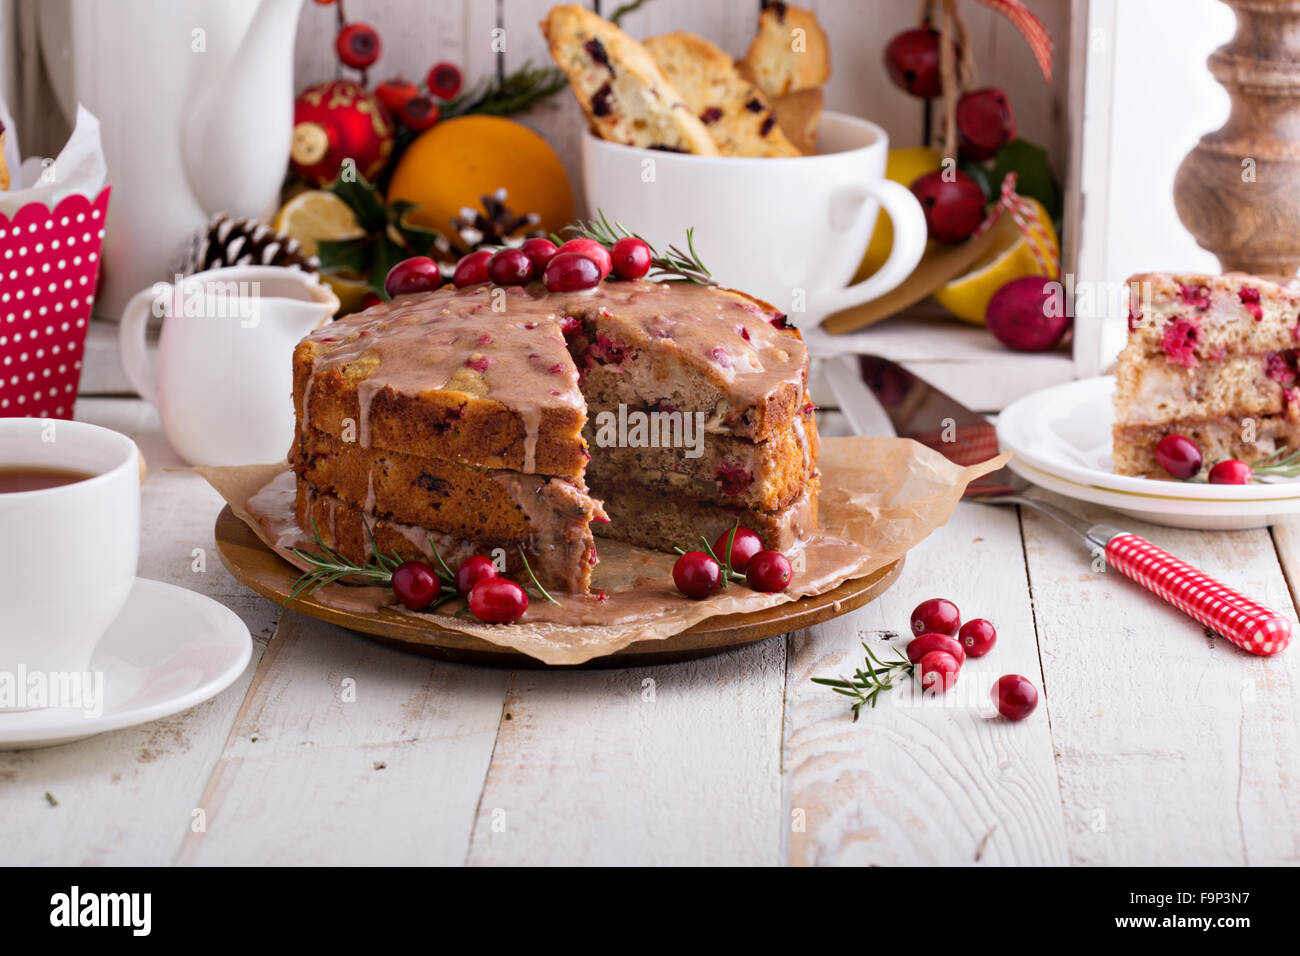 Cranberry Christmas Cake.Orange And Cranberry Christmas Cake With Cinnamon Glaze